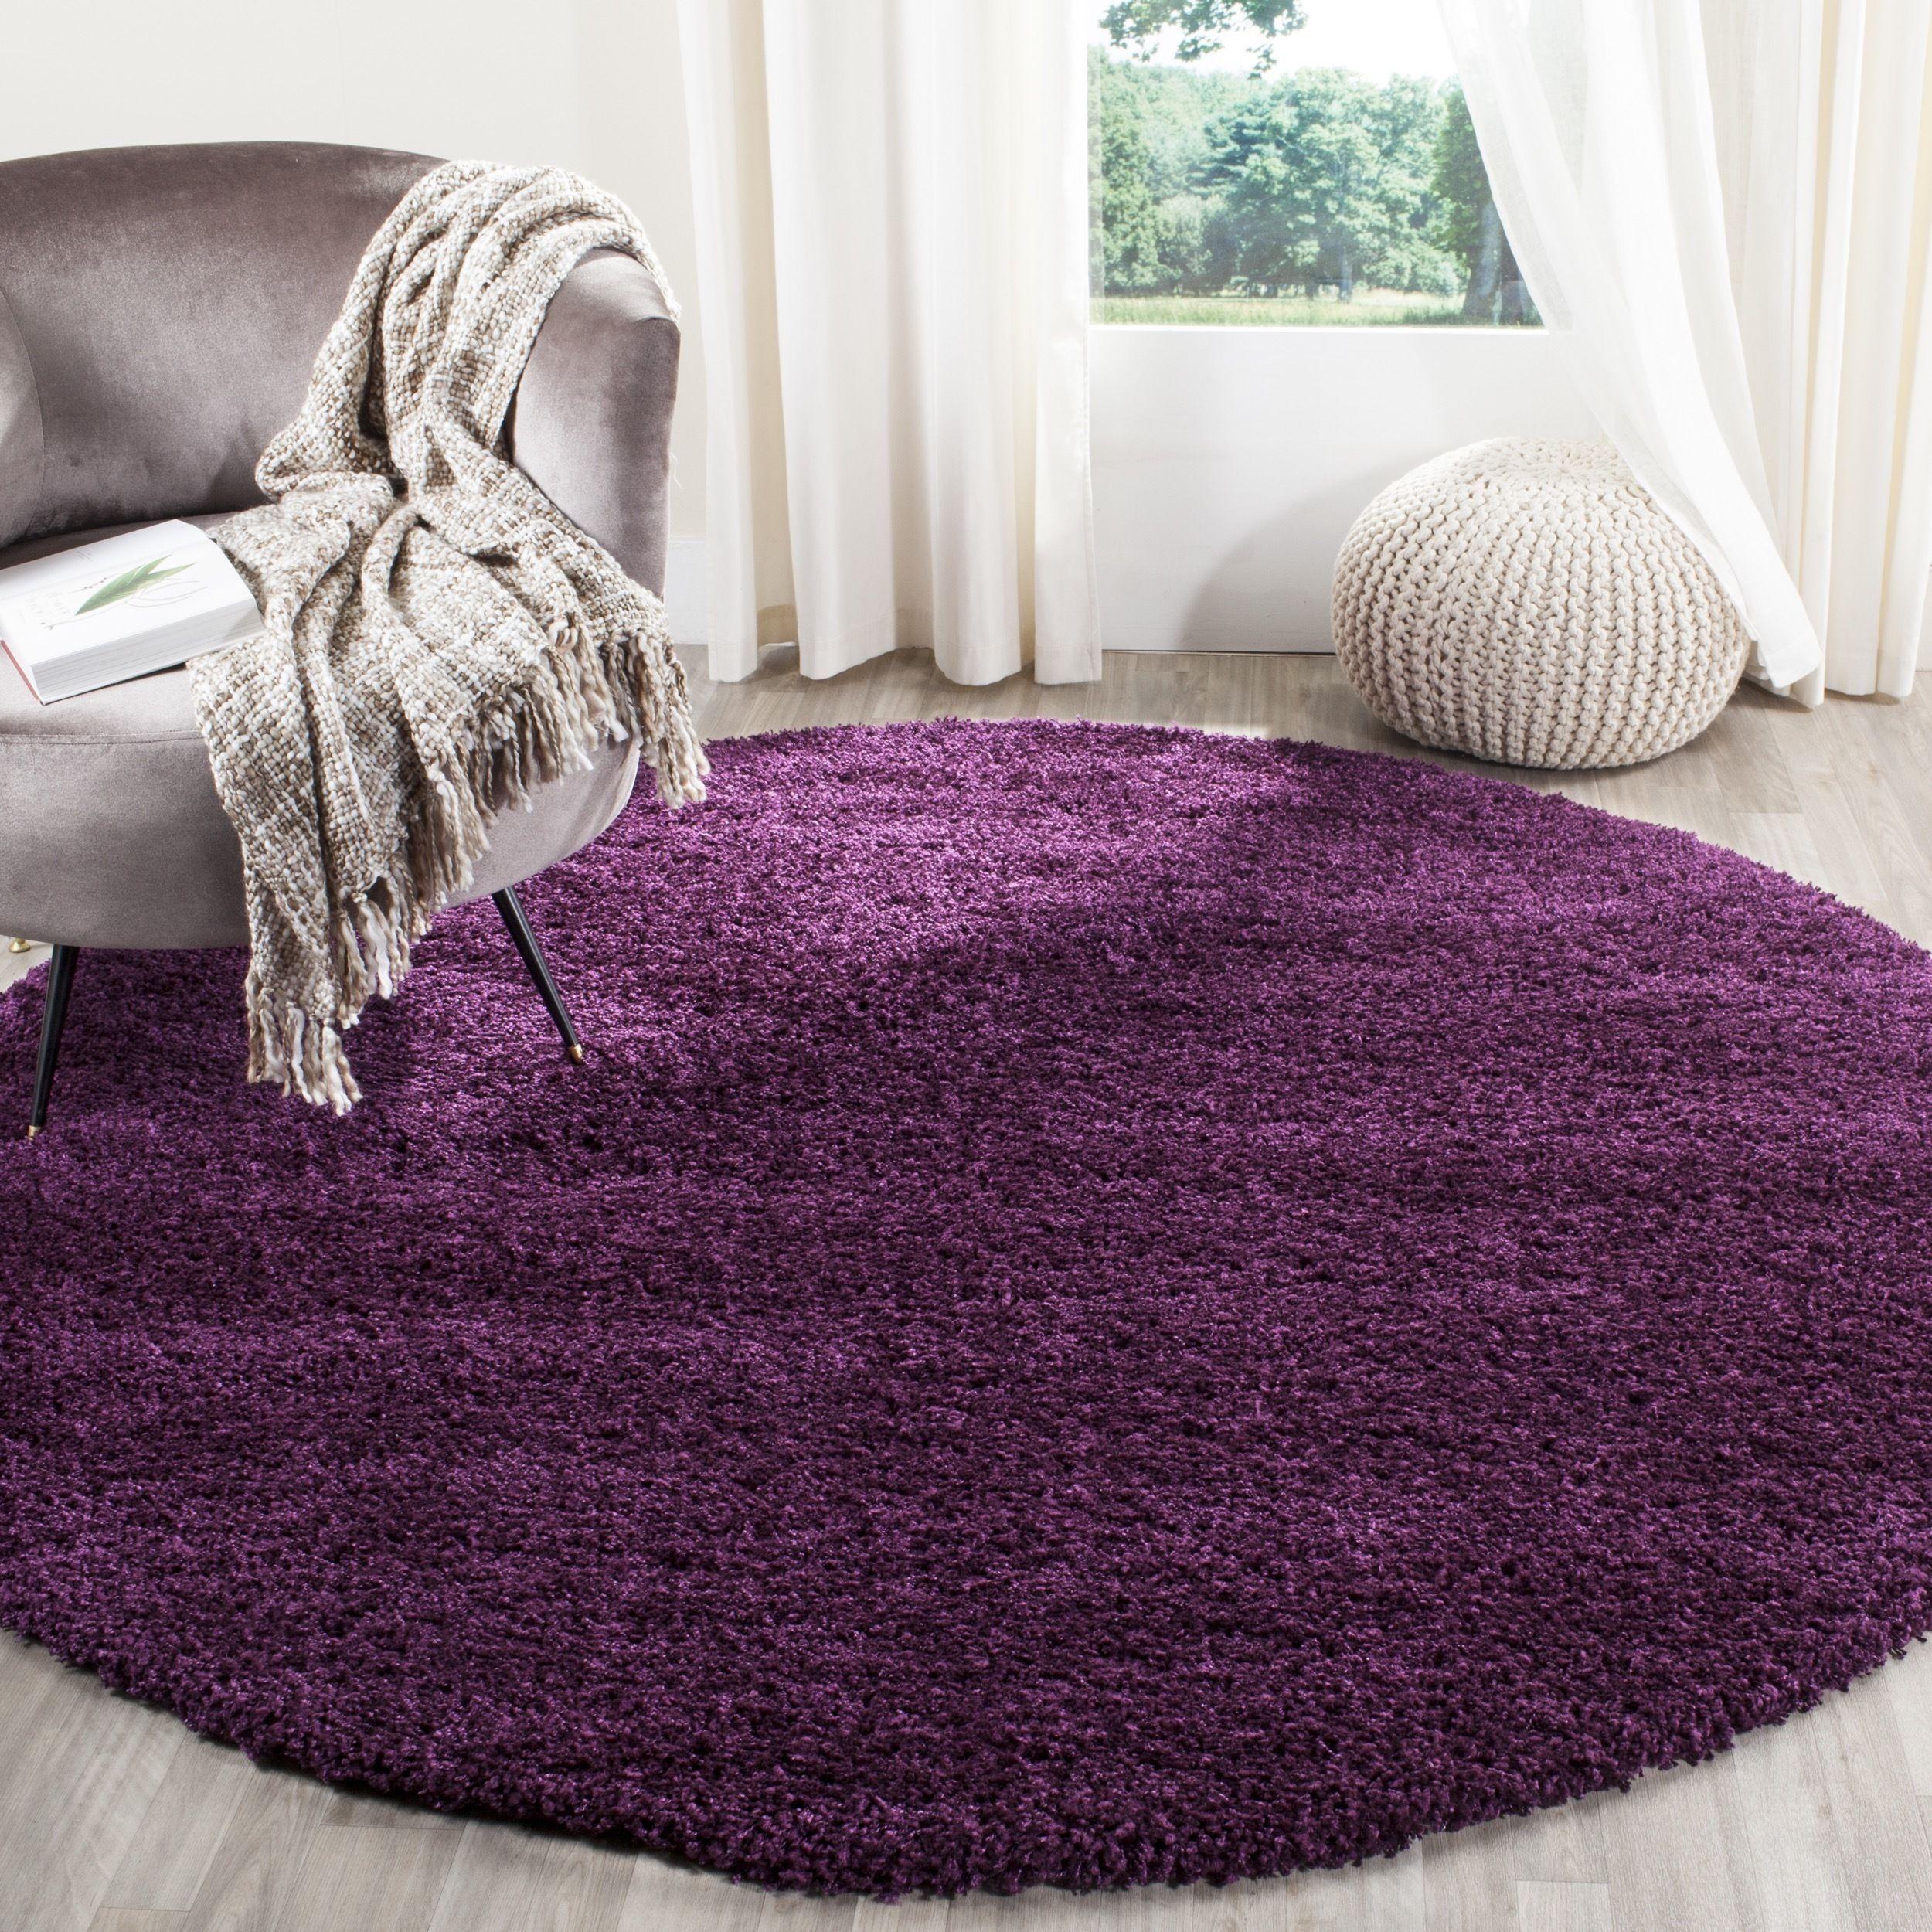 safavieh california cozy solid purple shag rug 6u0027 7 round sg151